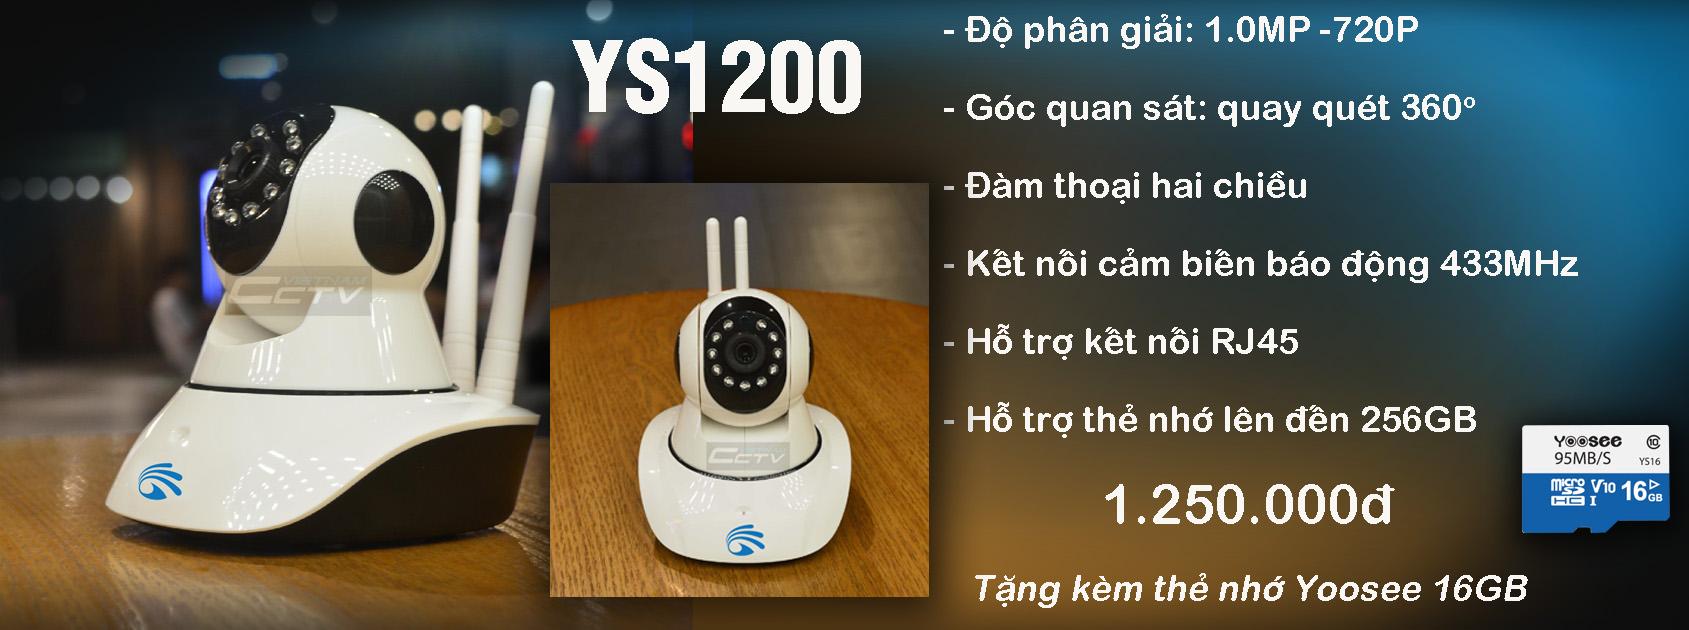 camera yoosee ys1200